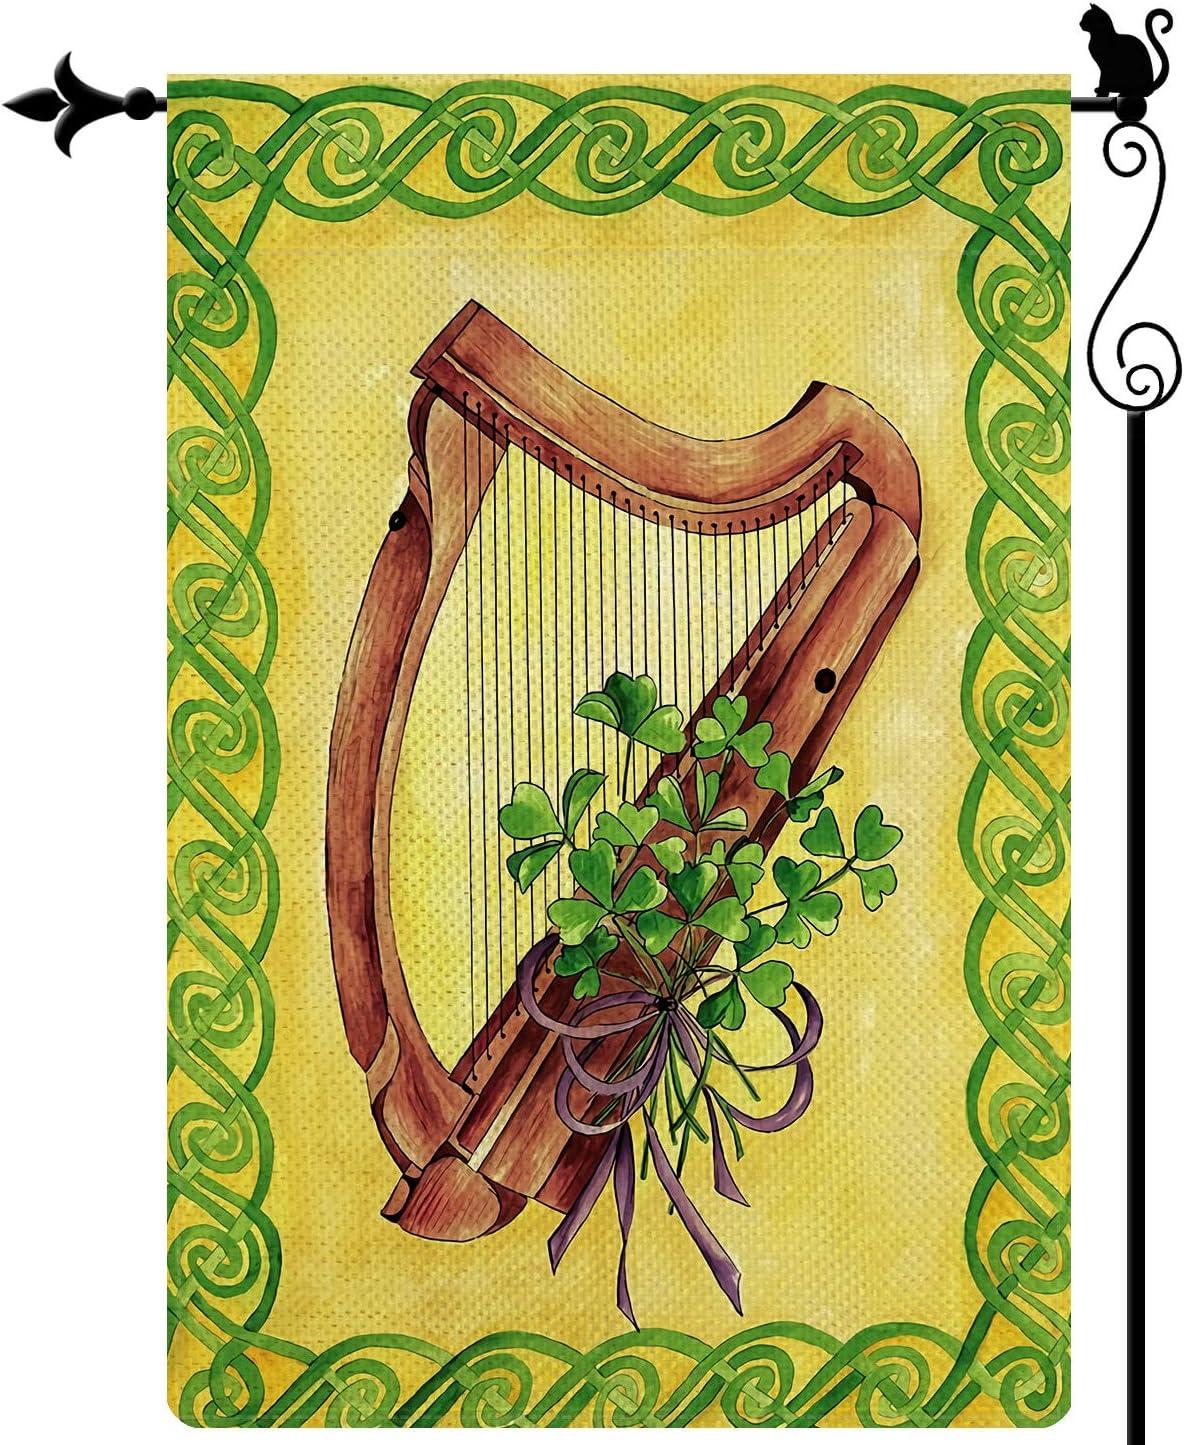 Gormcore Happy St. Patrick's Day Garden Flag Three Clover Lucky Harp Vertical Double Sided Rustic Farmland Burlap Yard Lawn Outdoor Decor 12.5x18